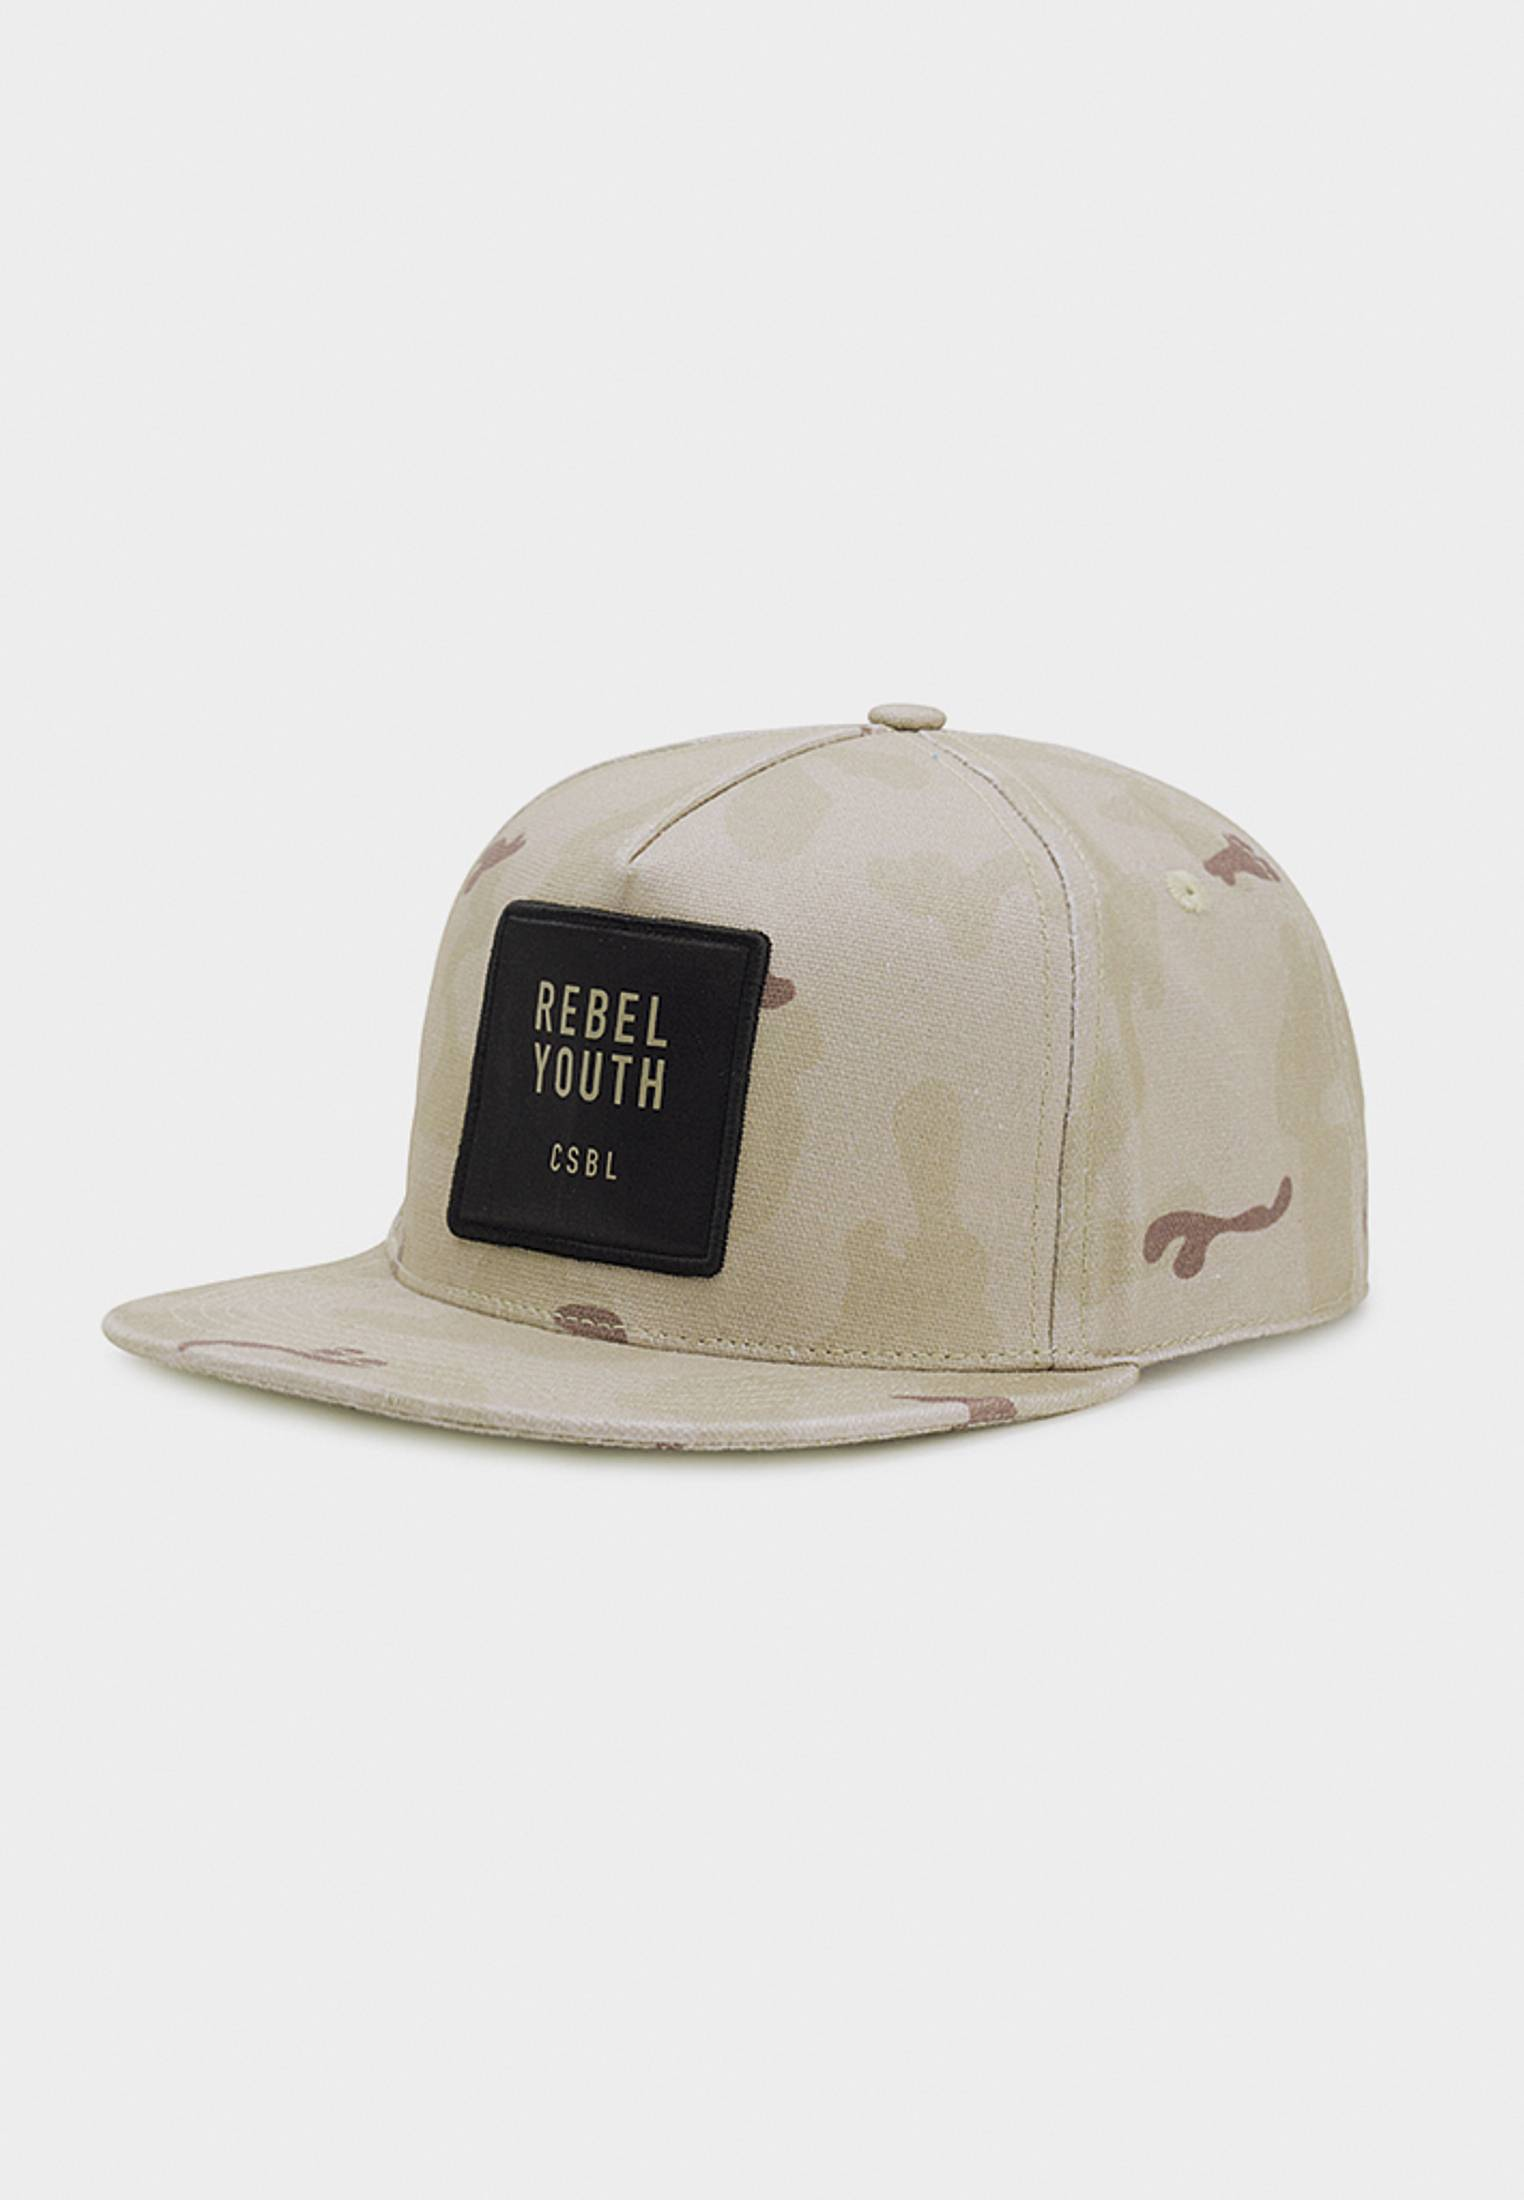 Urban Classics CSBL Rebel Youth Cap desert camo/black - One Size